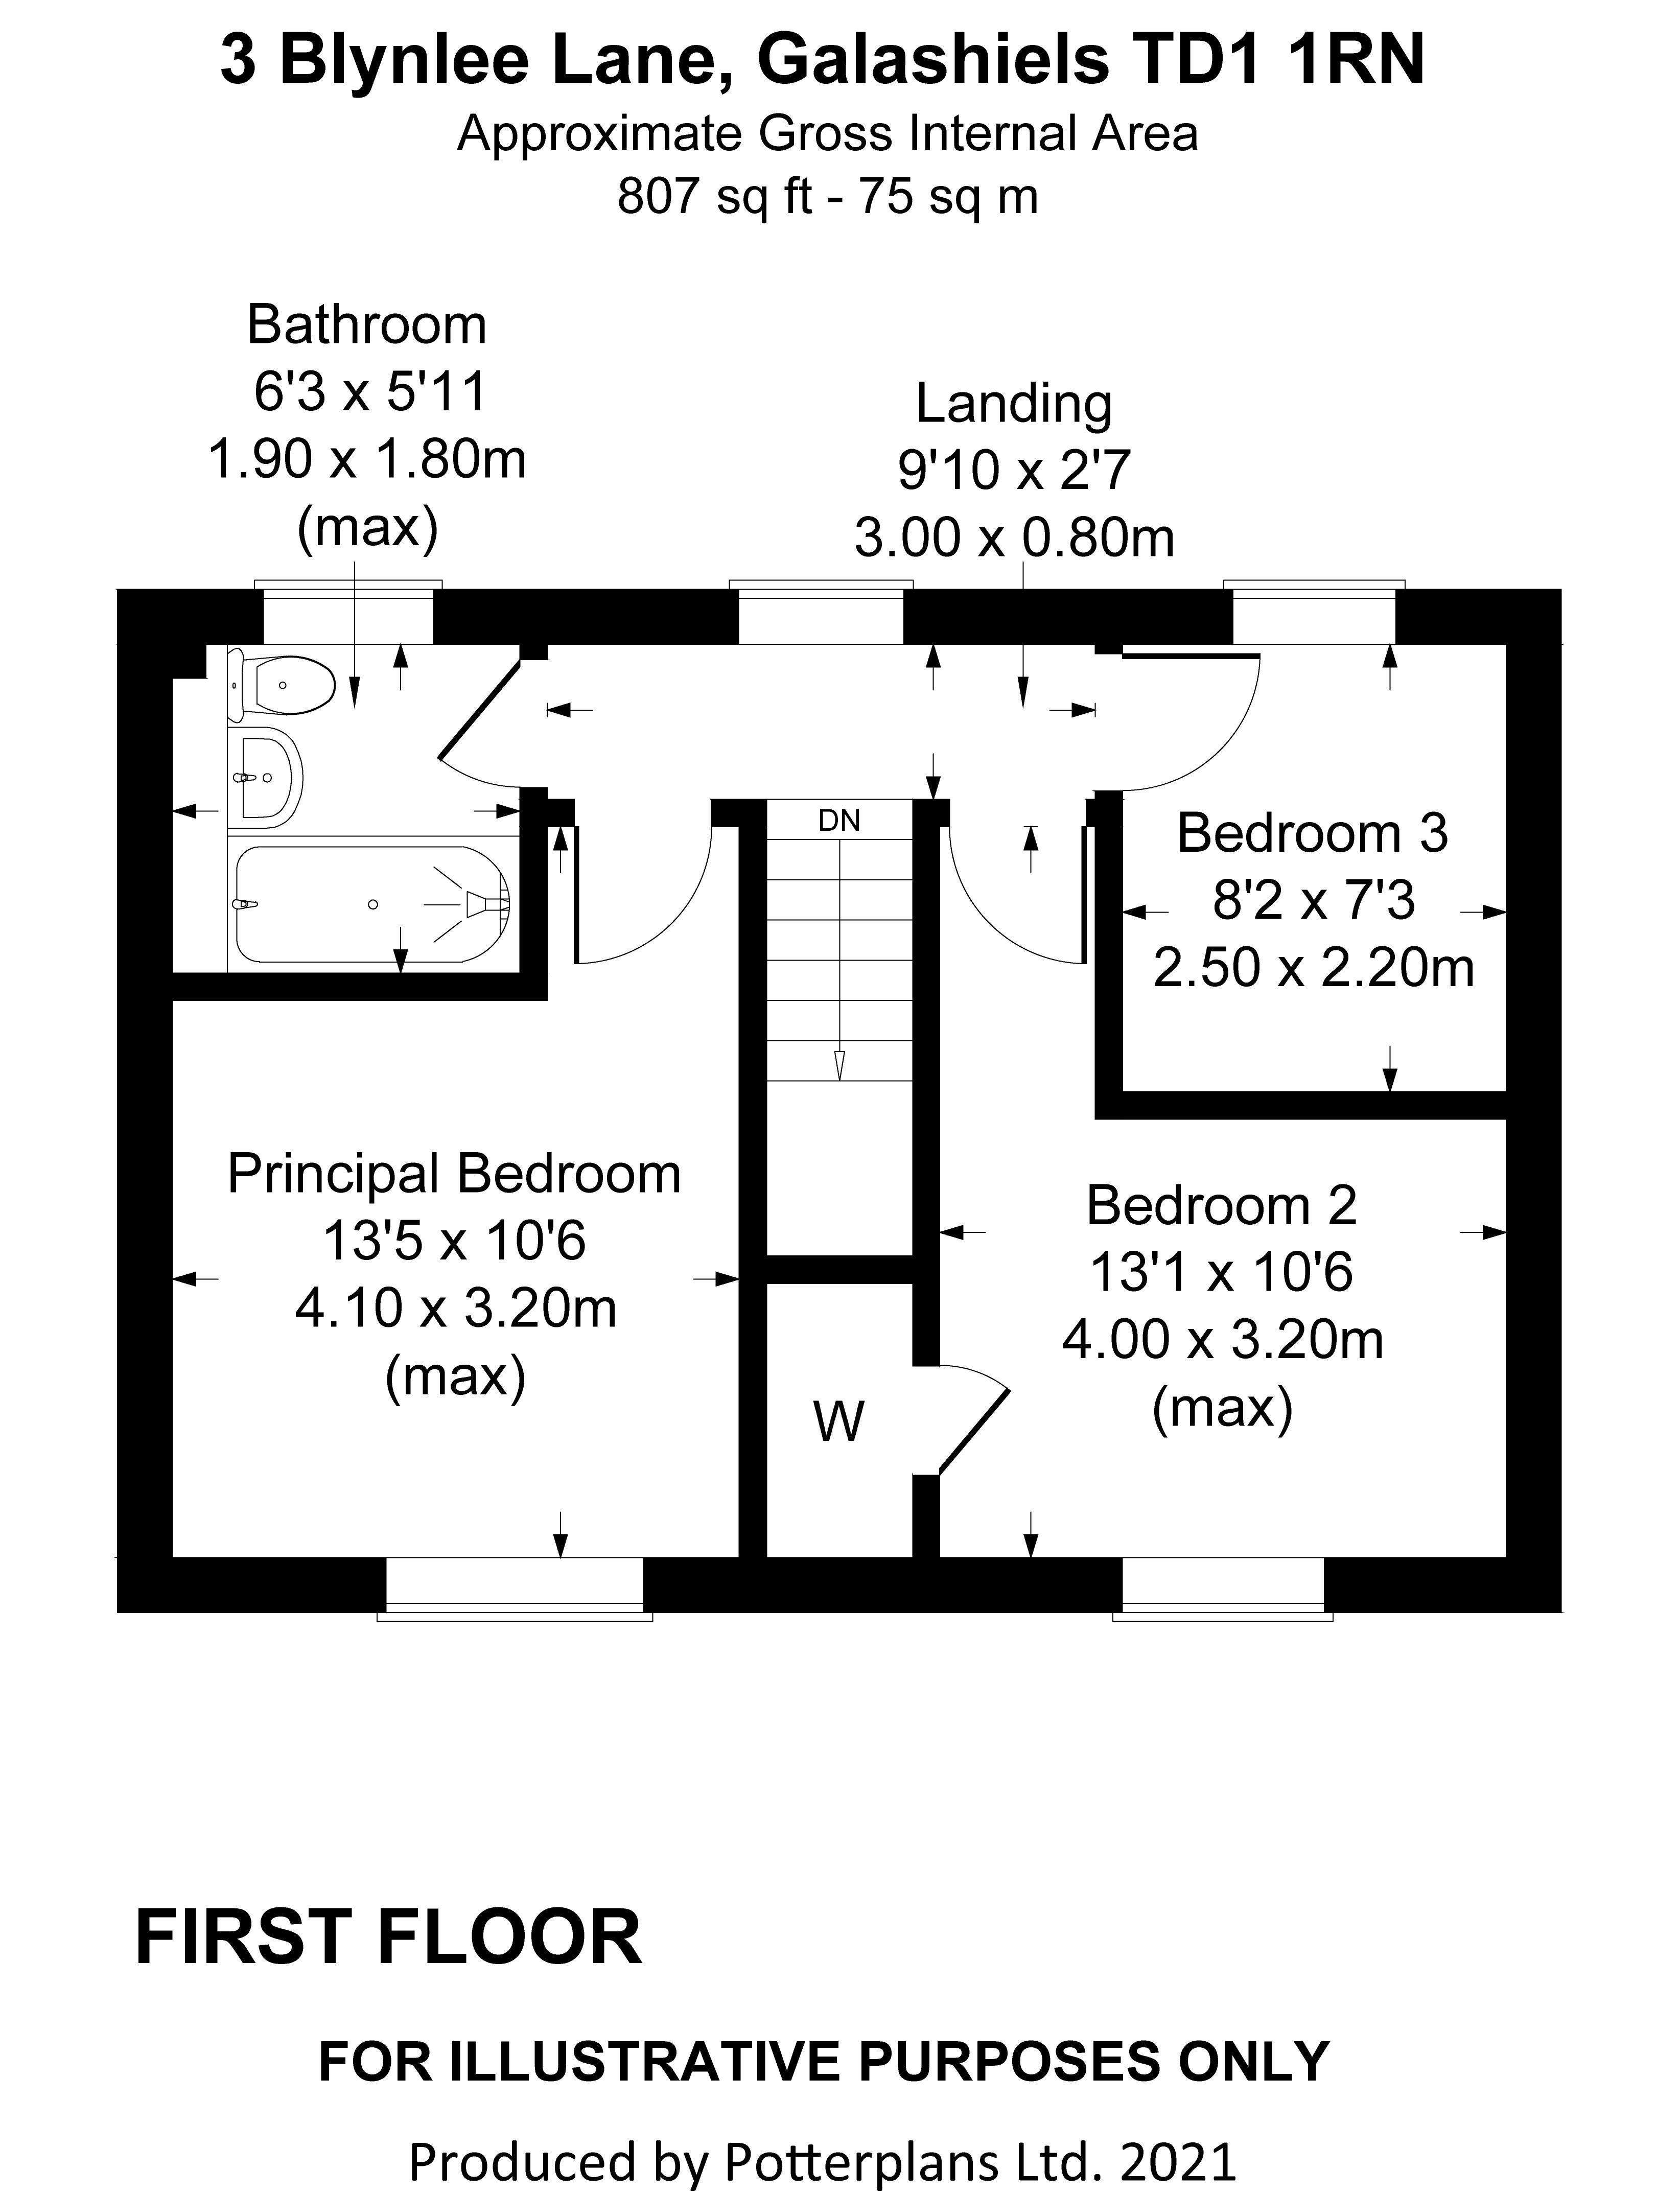 3 Blynlee Lane First Floor